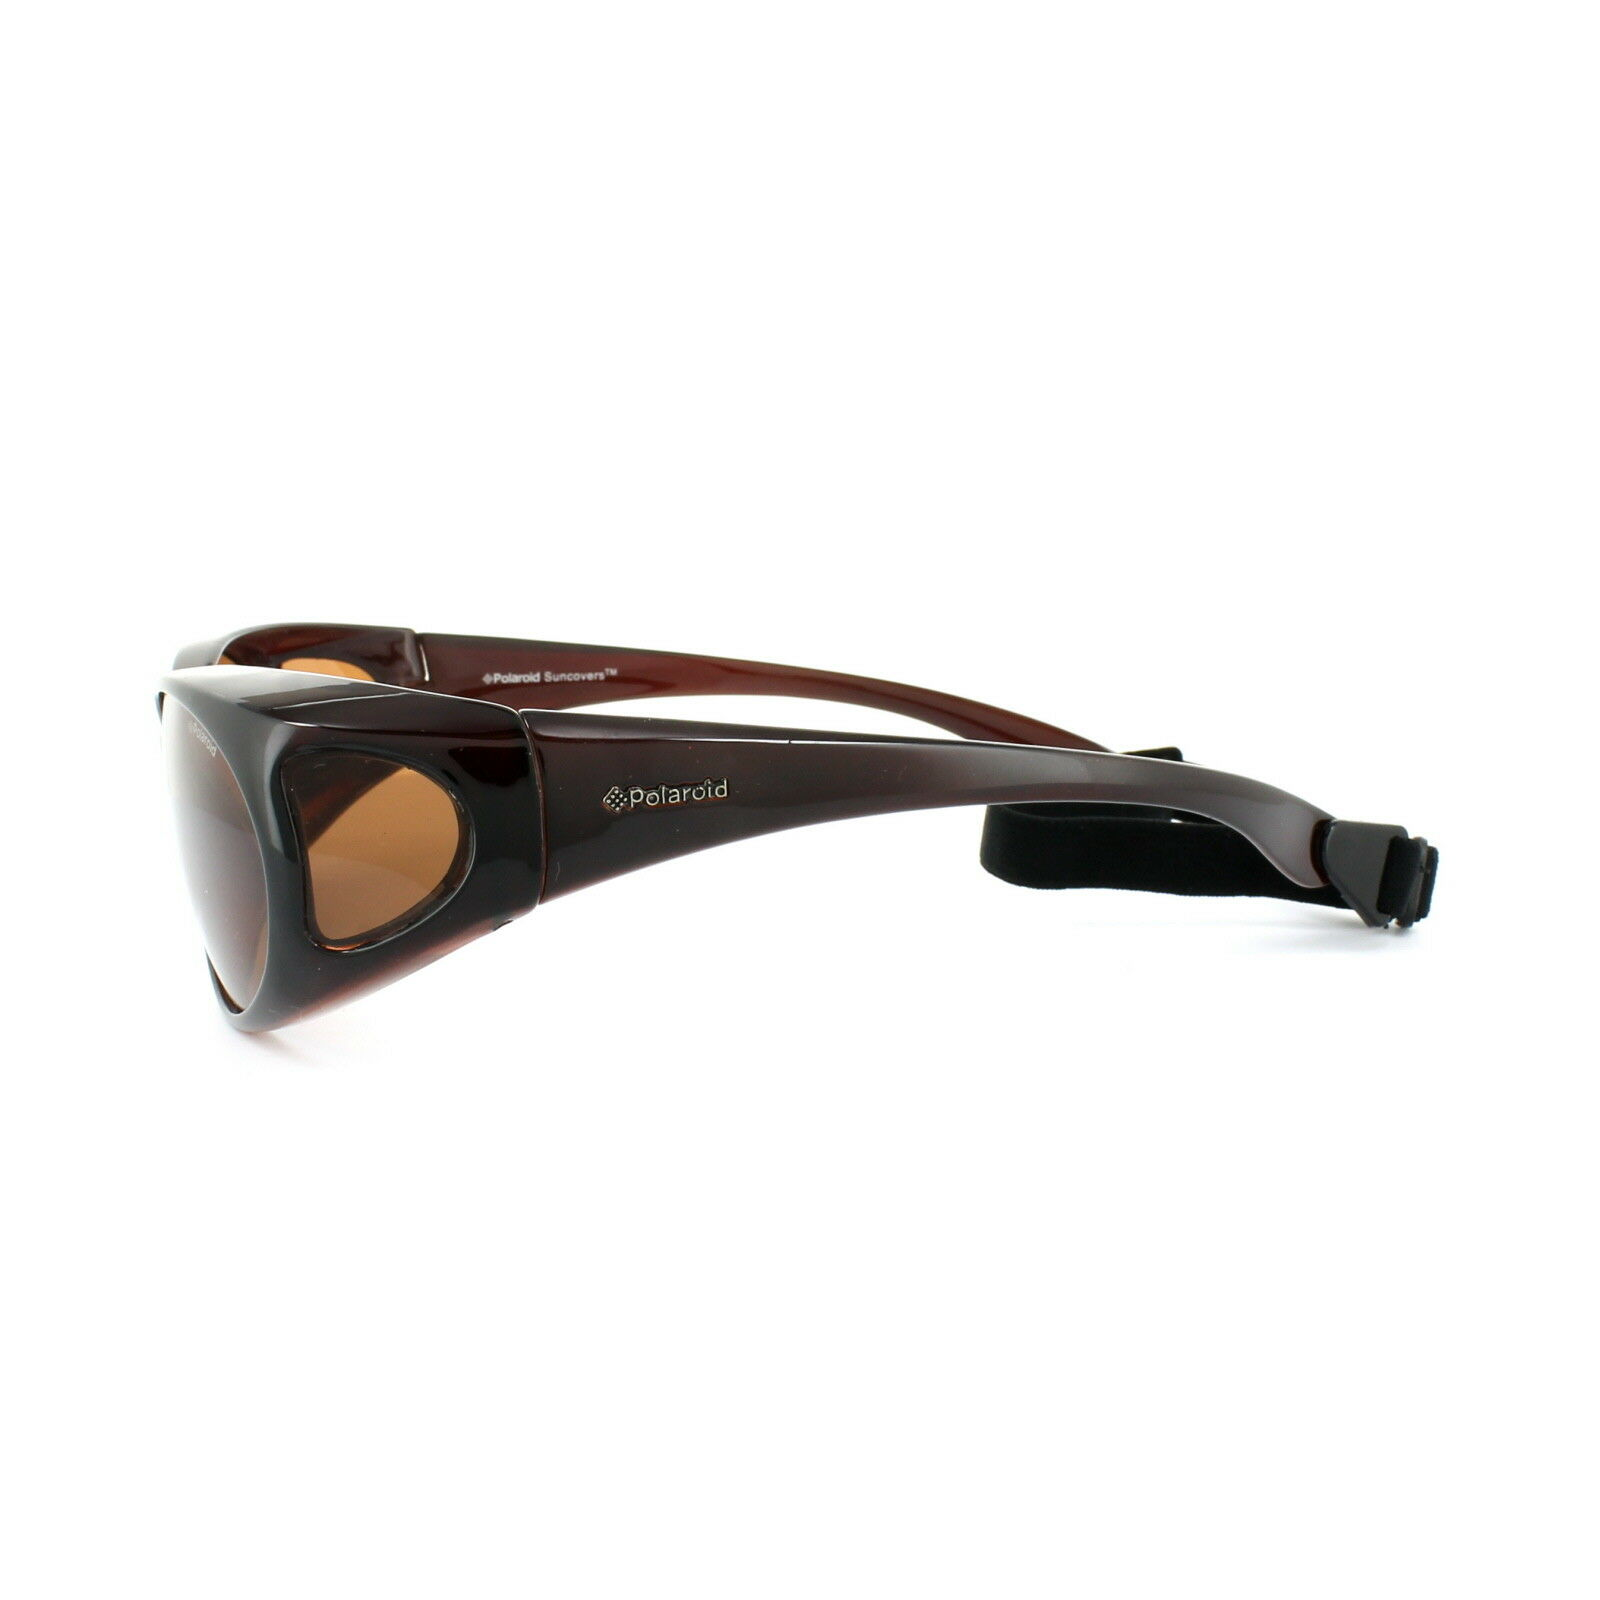 cd83a004c98 Polaroid Suncovers Fitover Sunglasses P8900 09q He Brown Copper ...